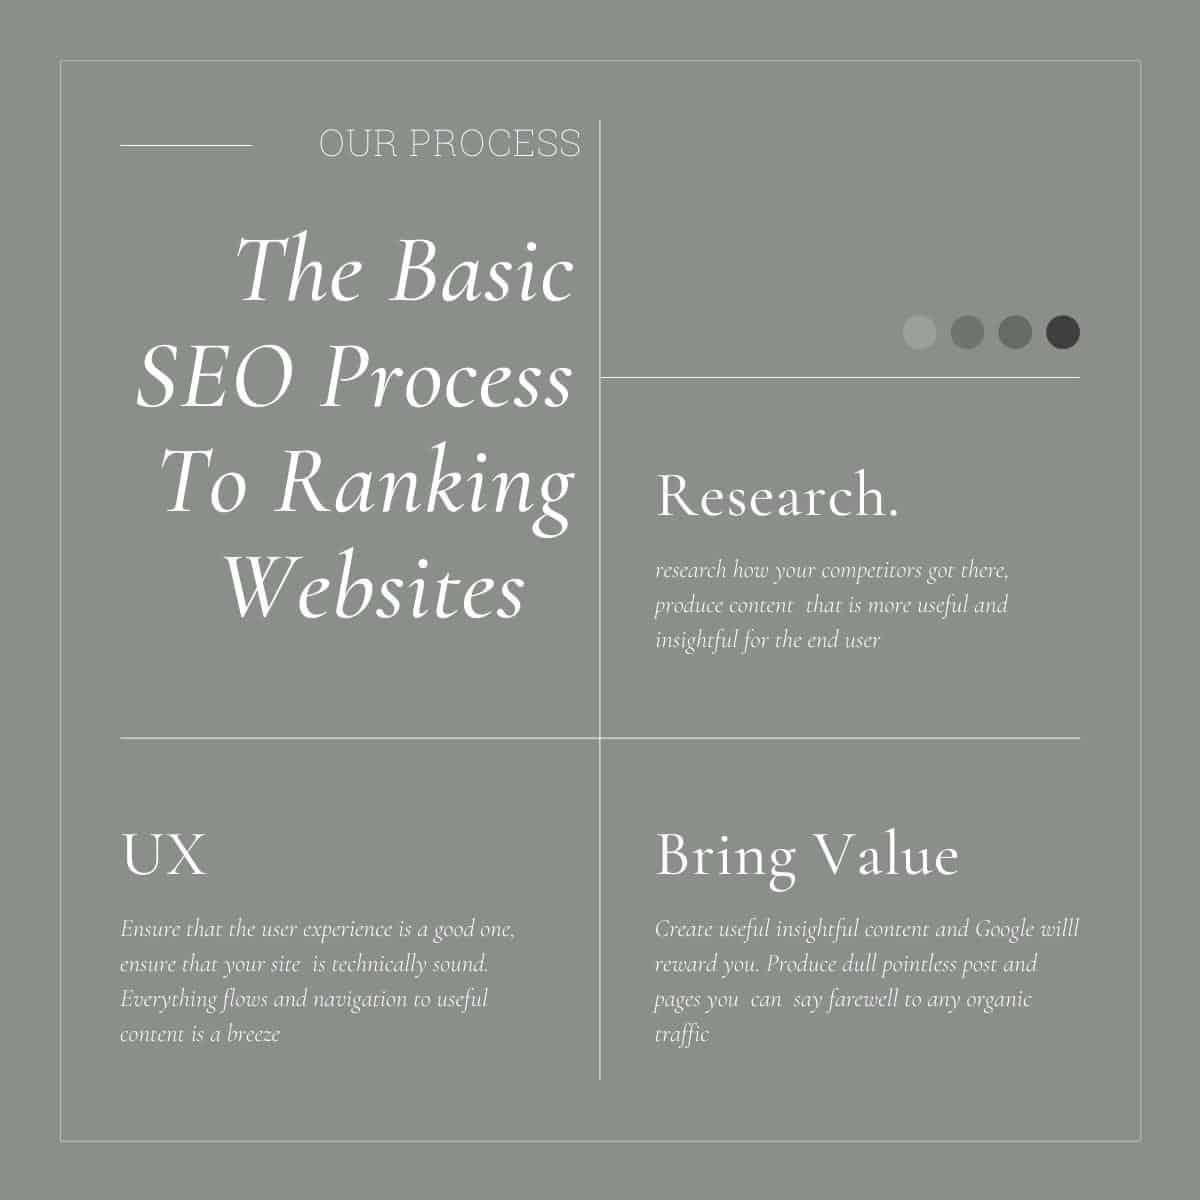 the process of basic seo